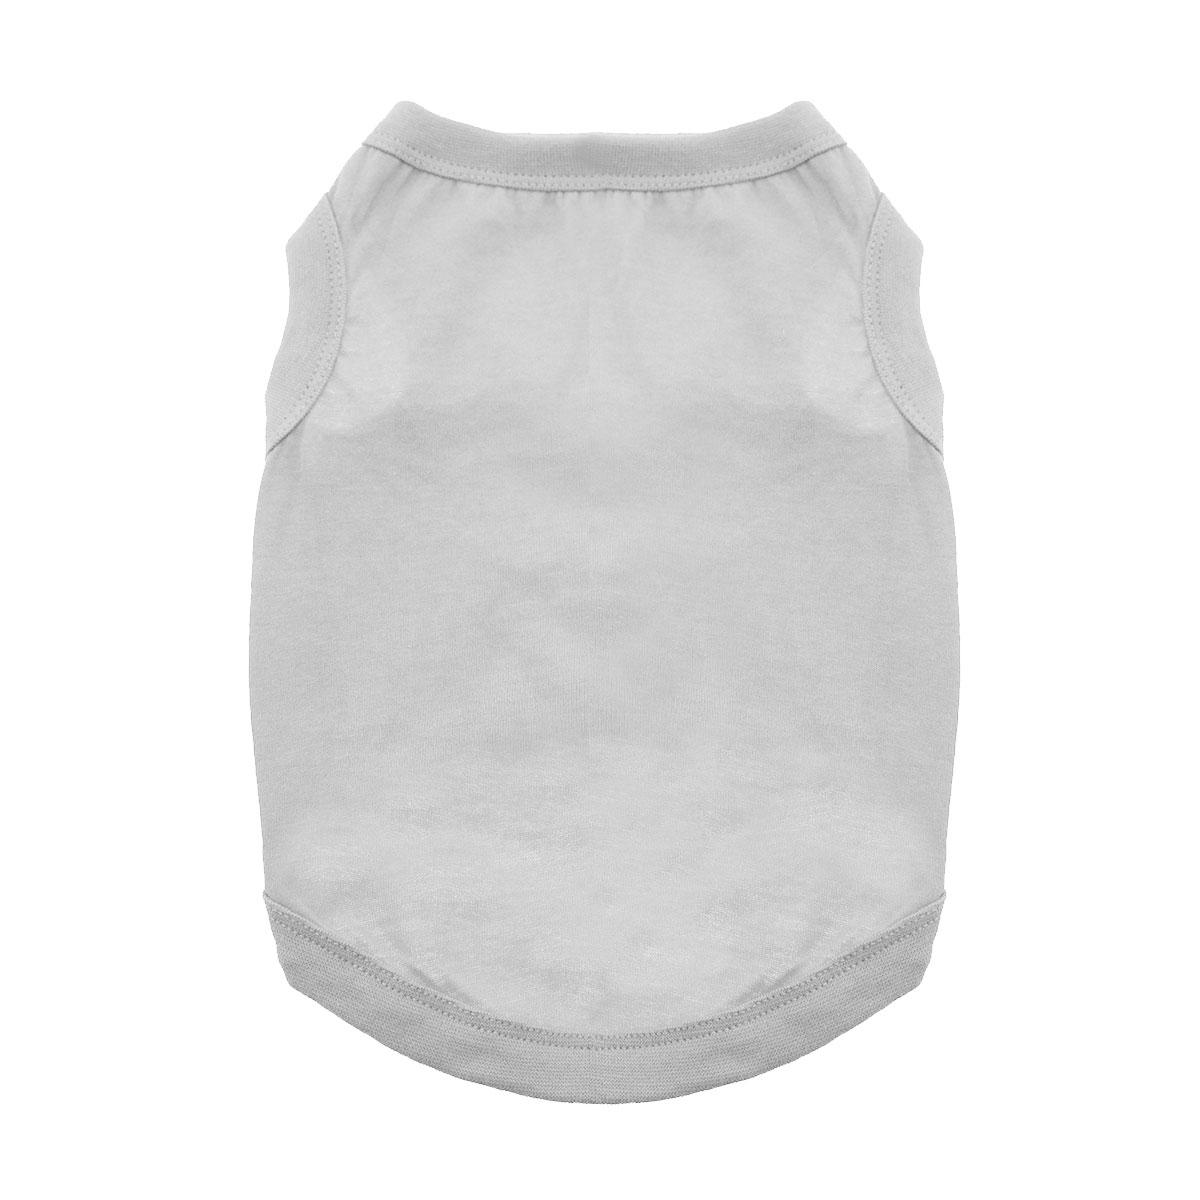 Cotton Dog Tank by Doggie Design - Glacier Gray